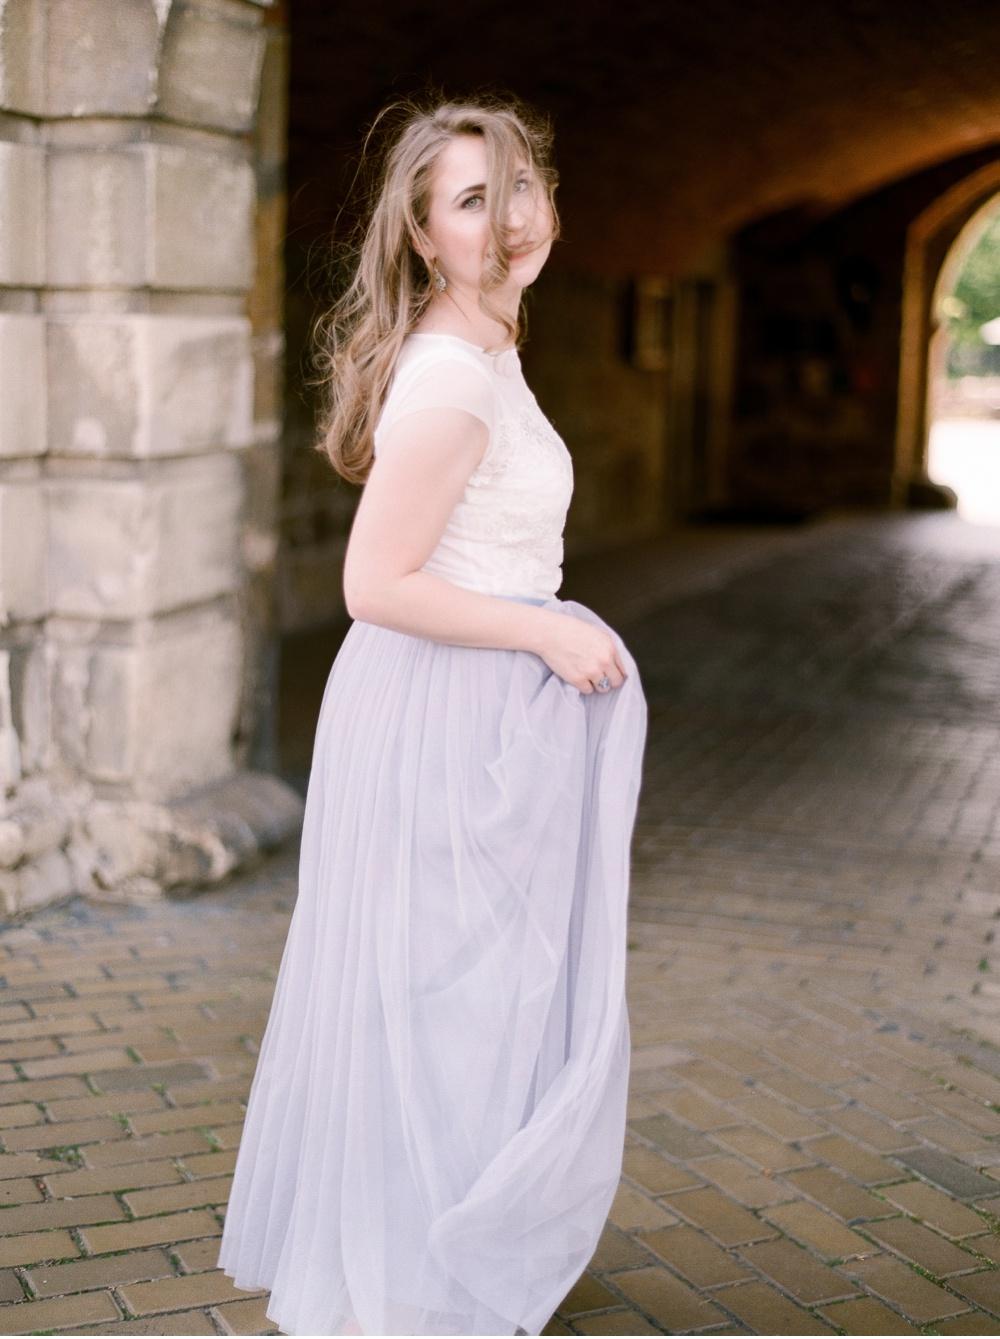 NRW_Hochzeitsfotograf©MadalinaSheldon_0006.jpg